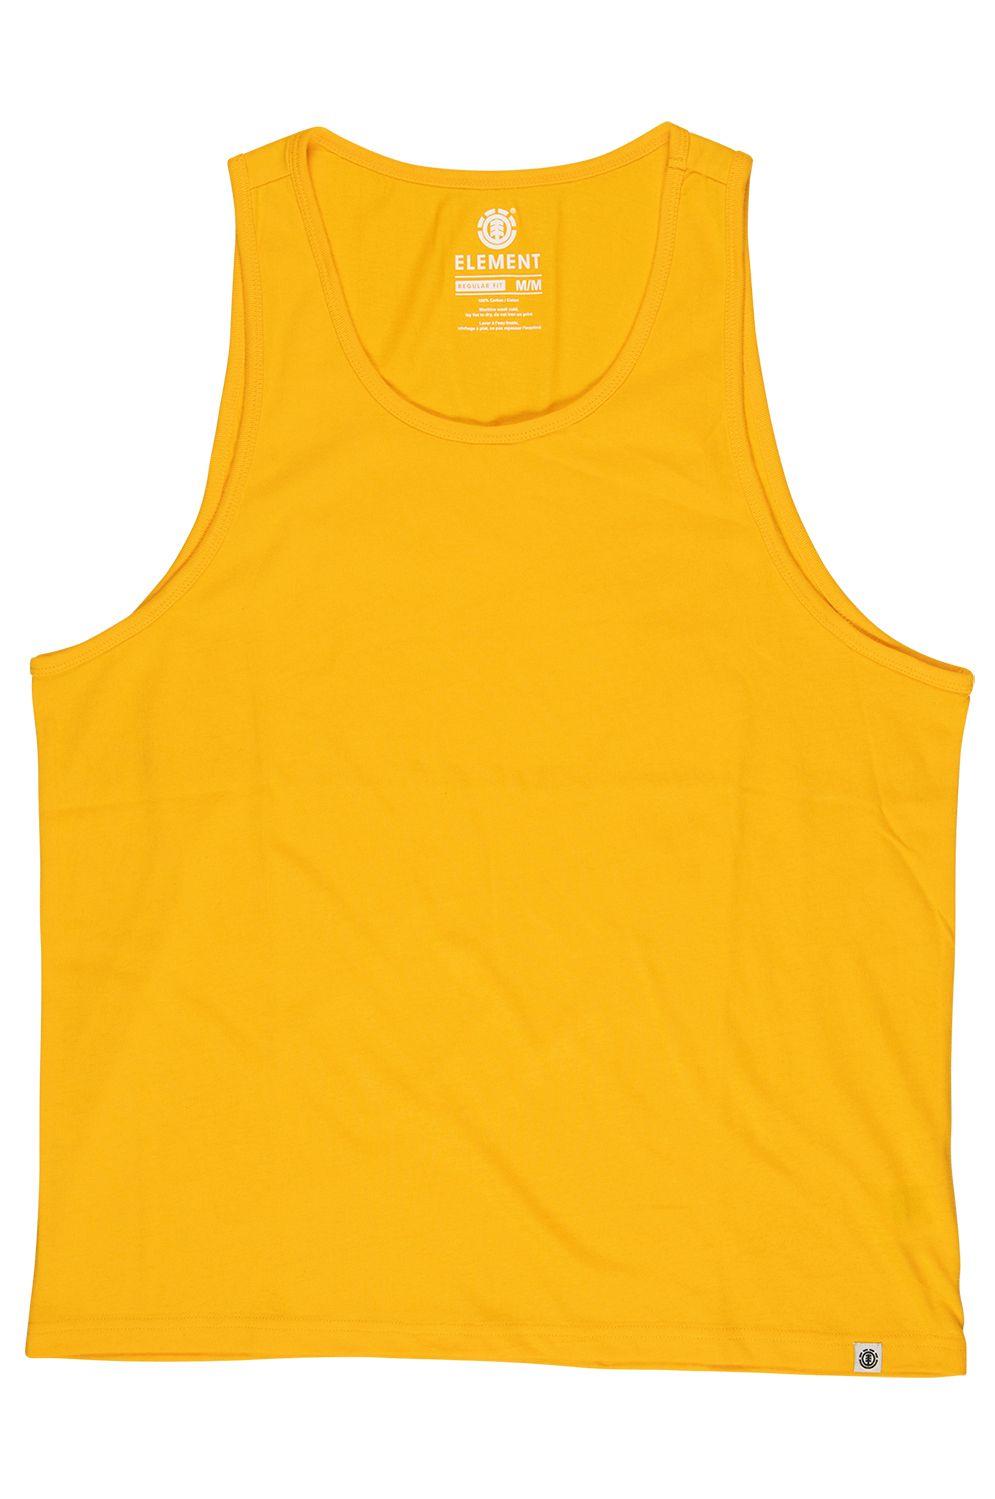 Element T-Shirt Tank Top BASIC Gold